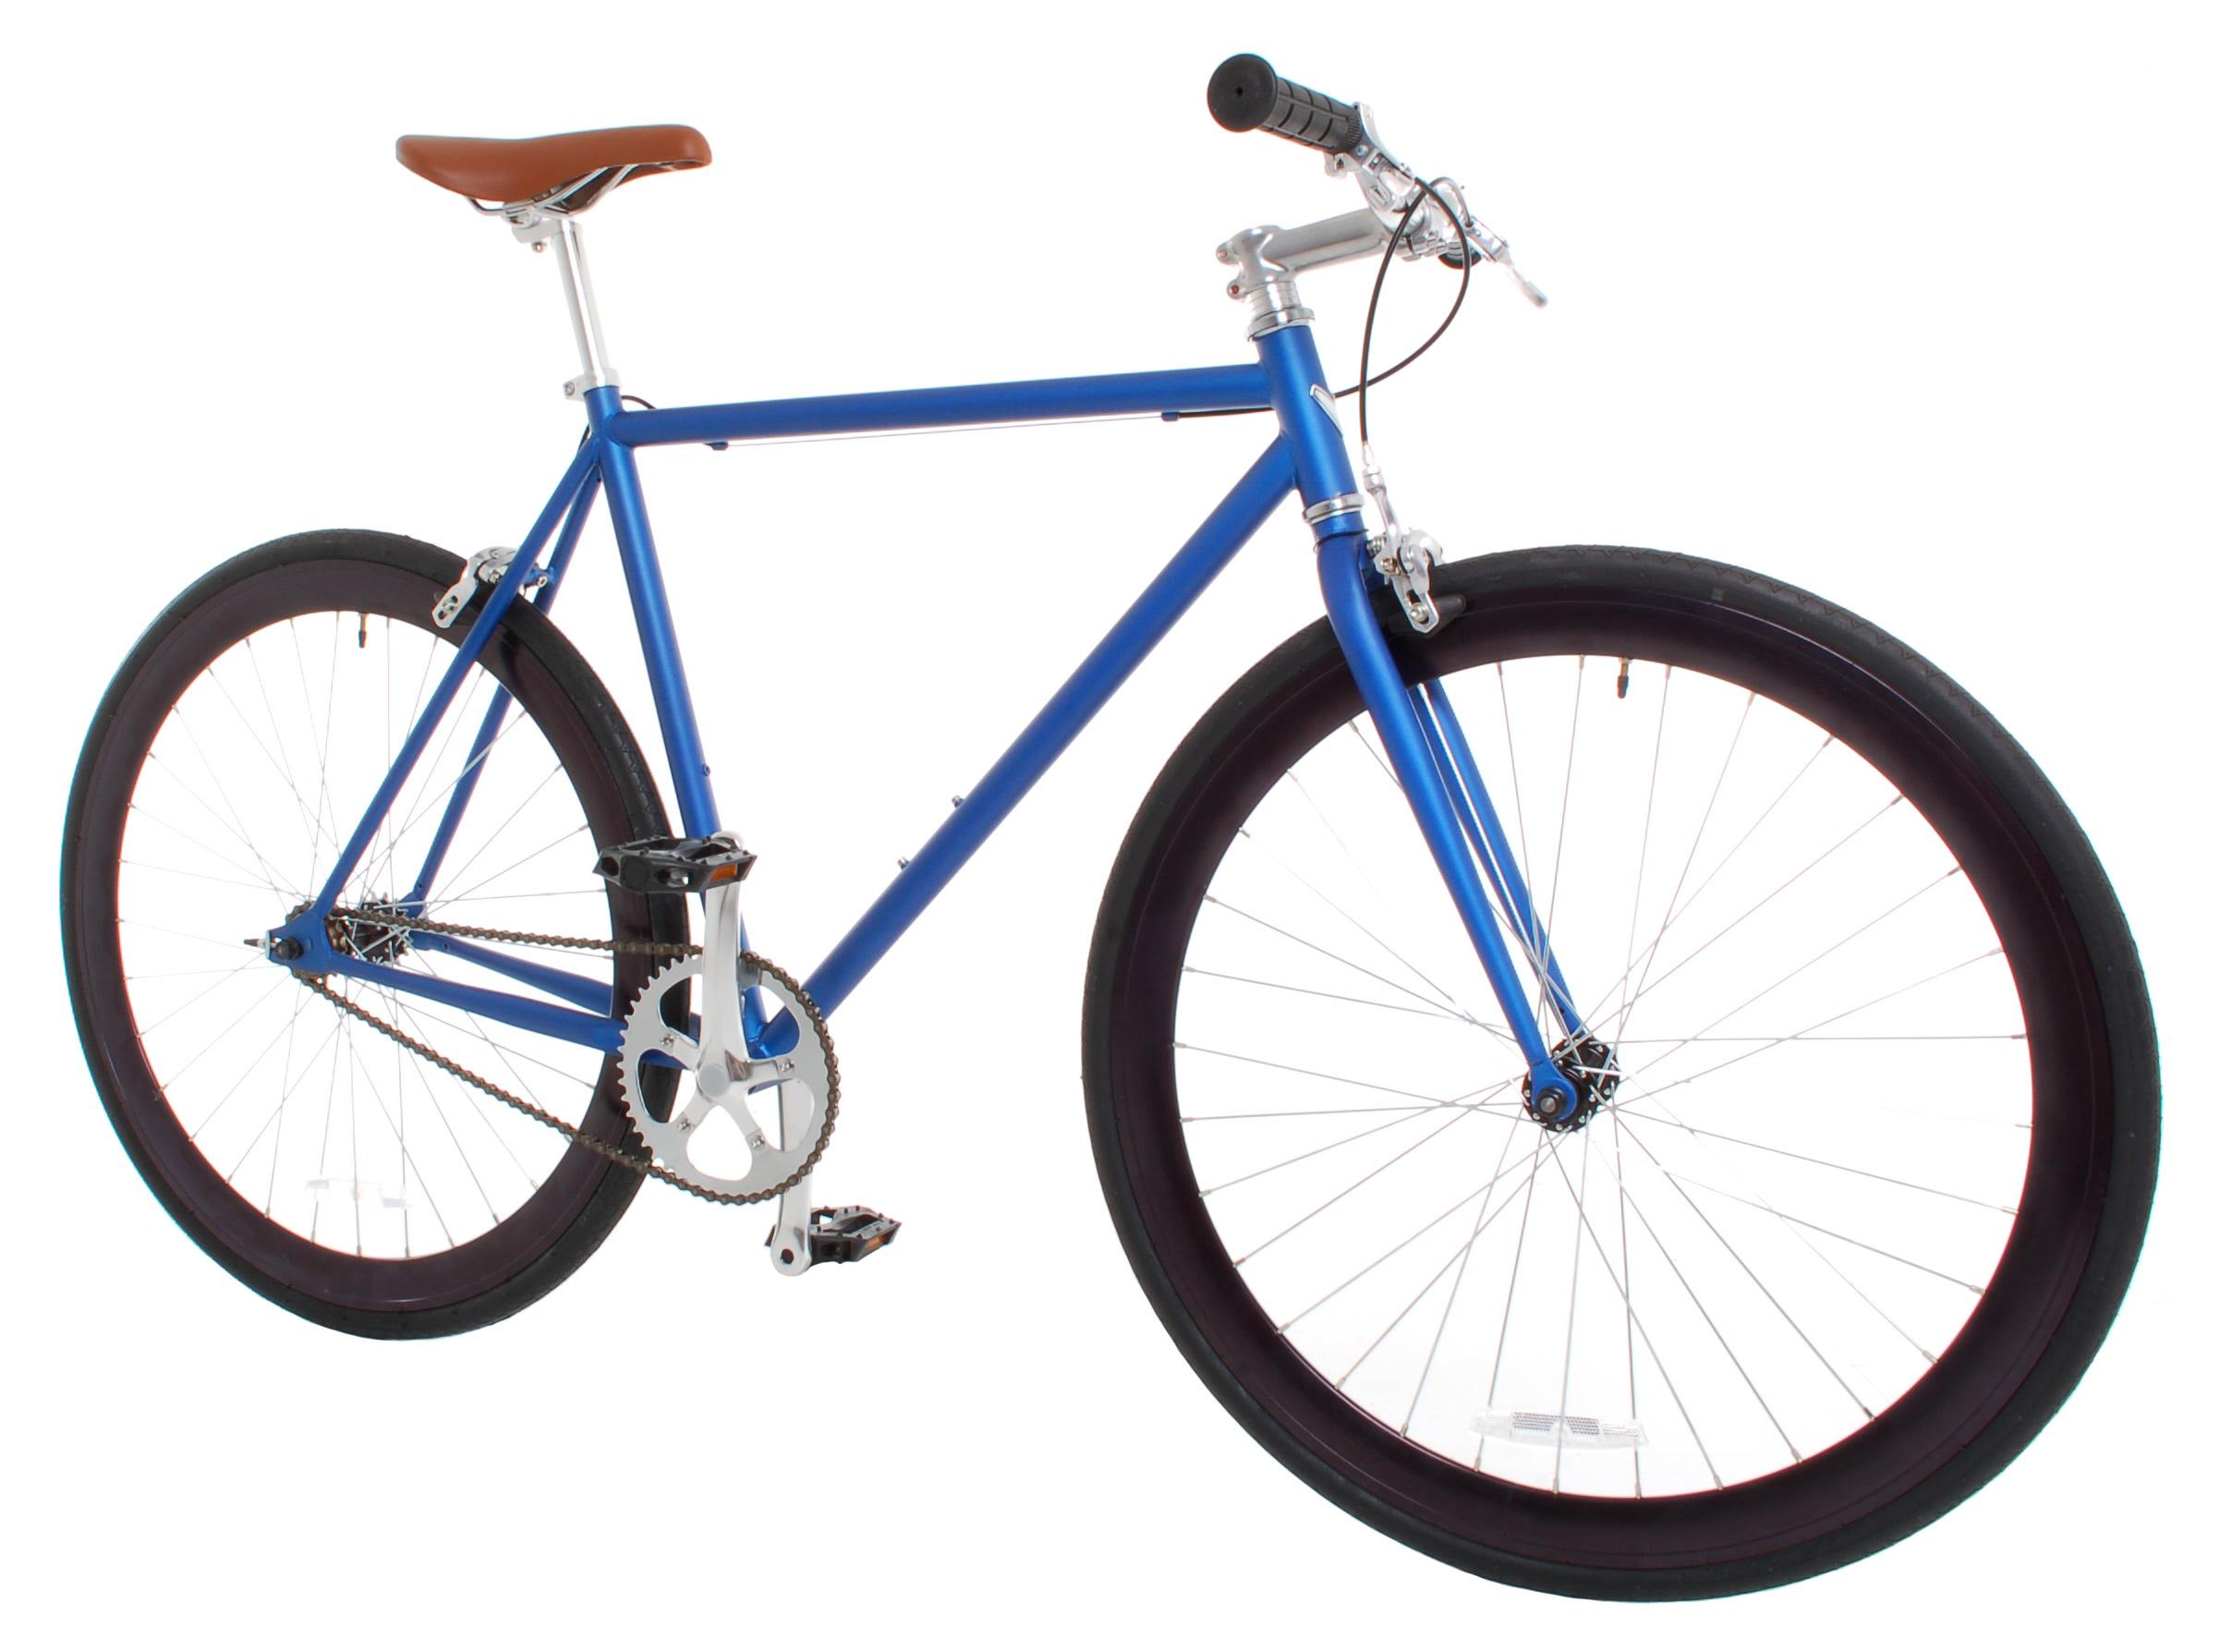 Vilano Rampage Fixed Gear Bike Fixie Road Bike | eBay